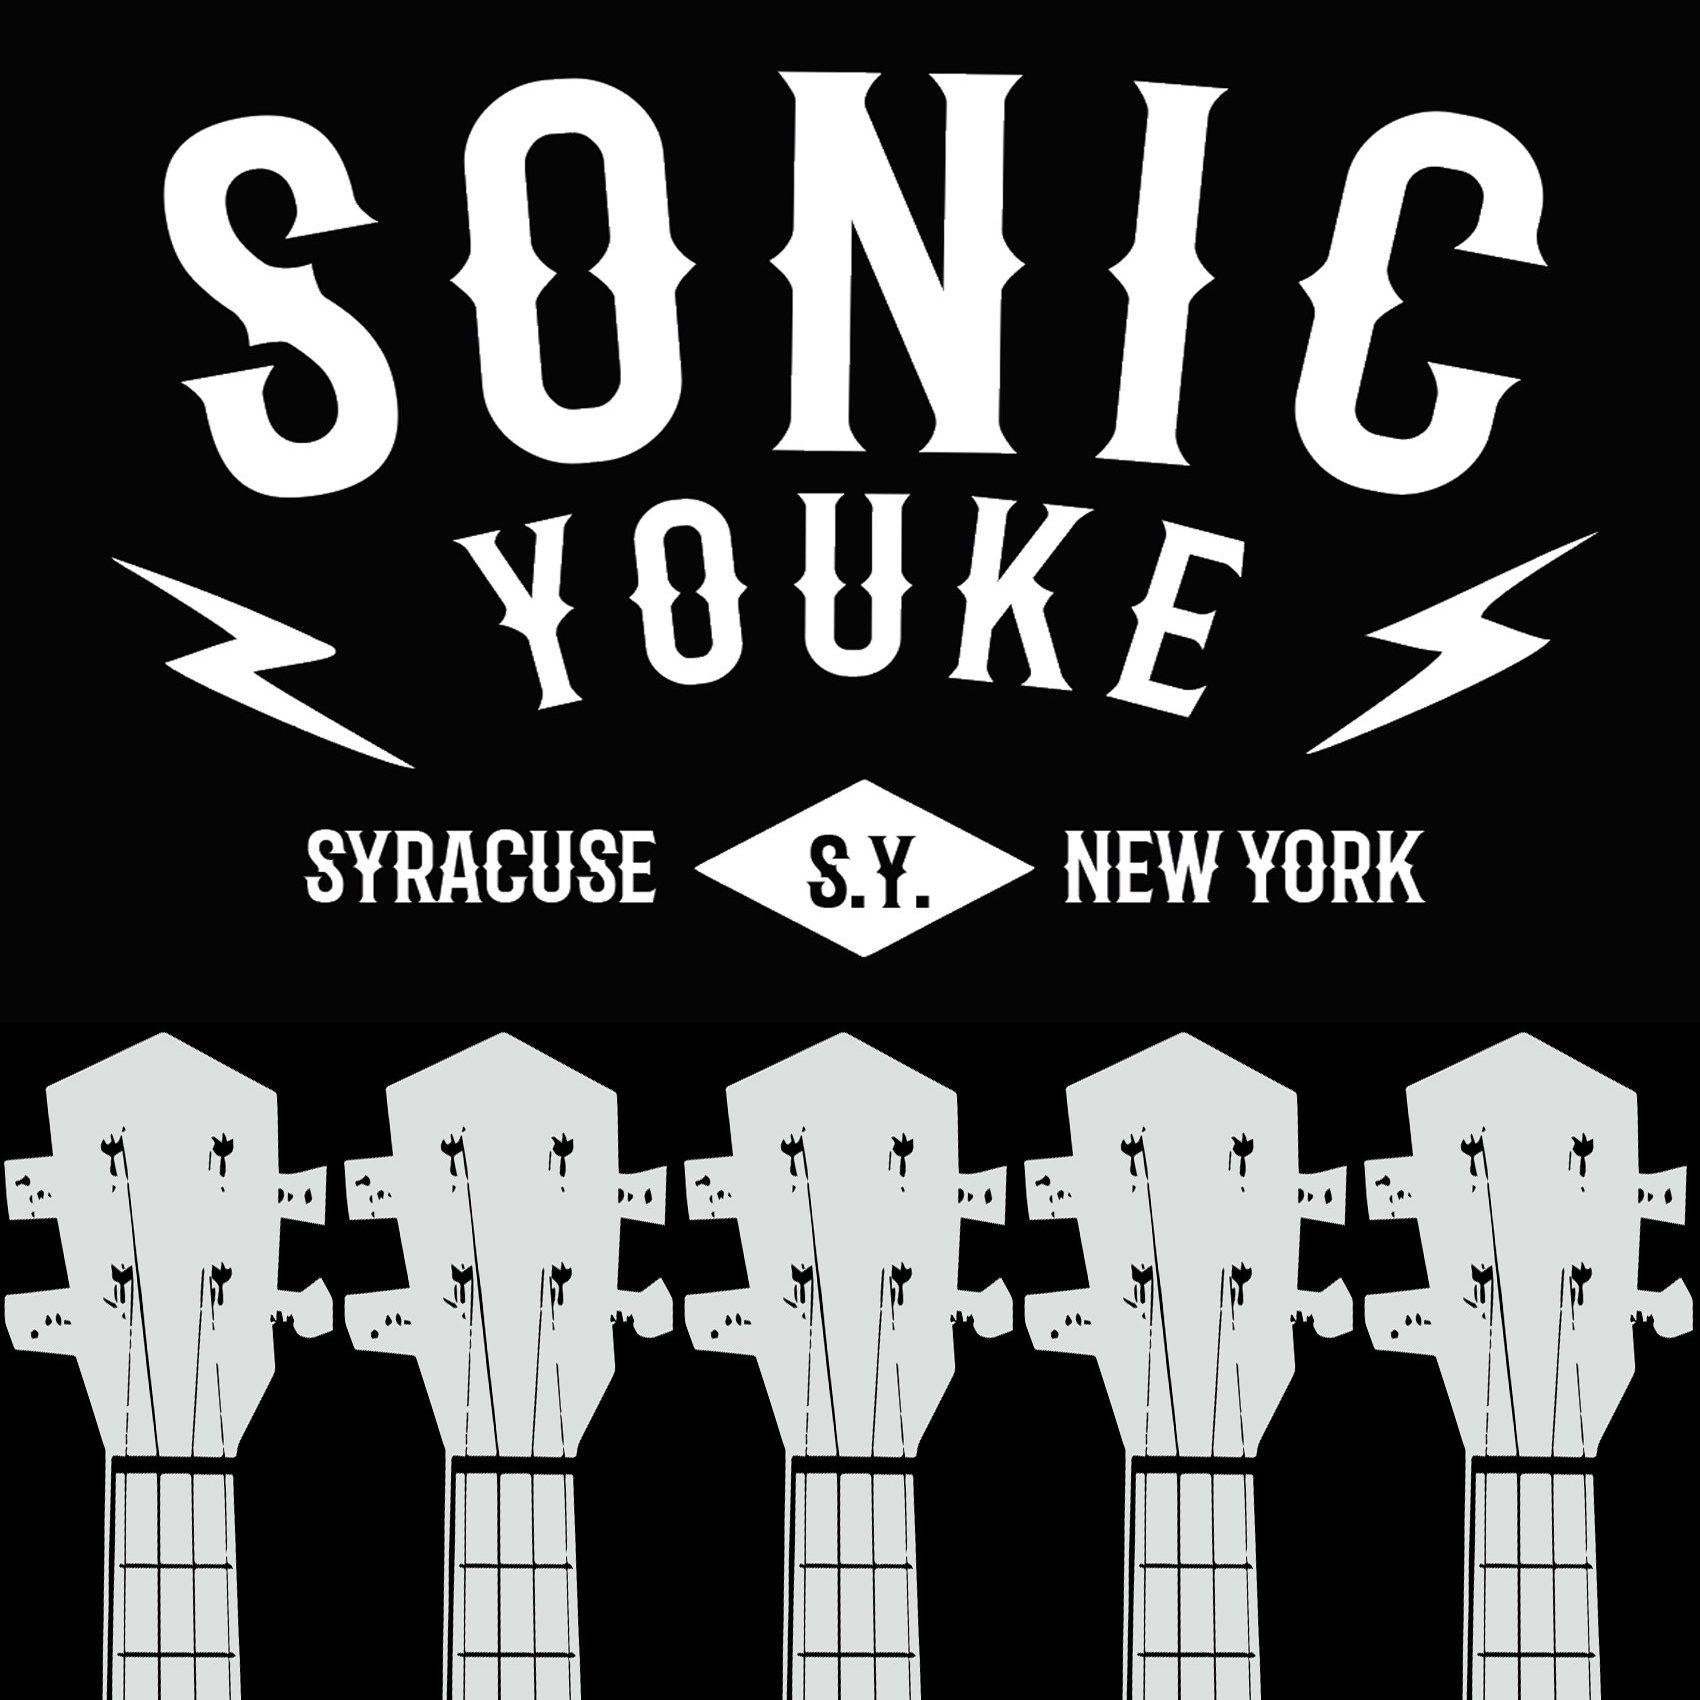 Sonic Youke